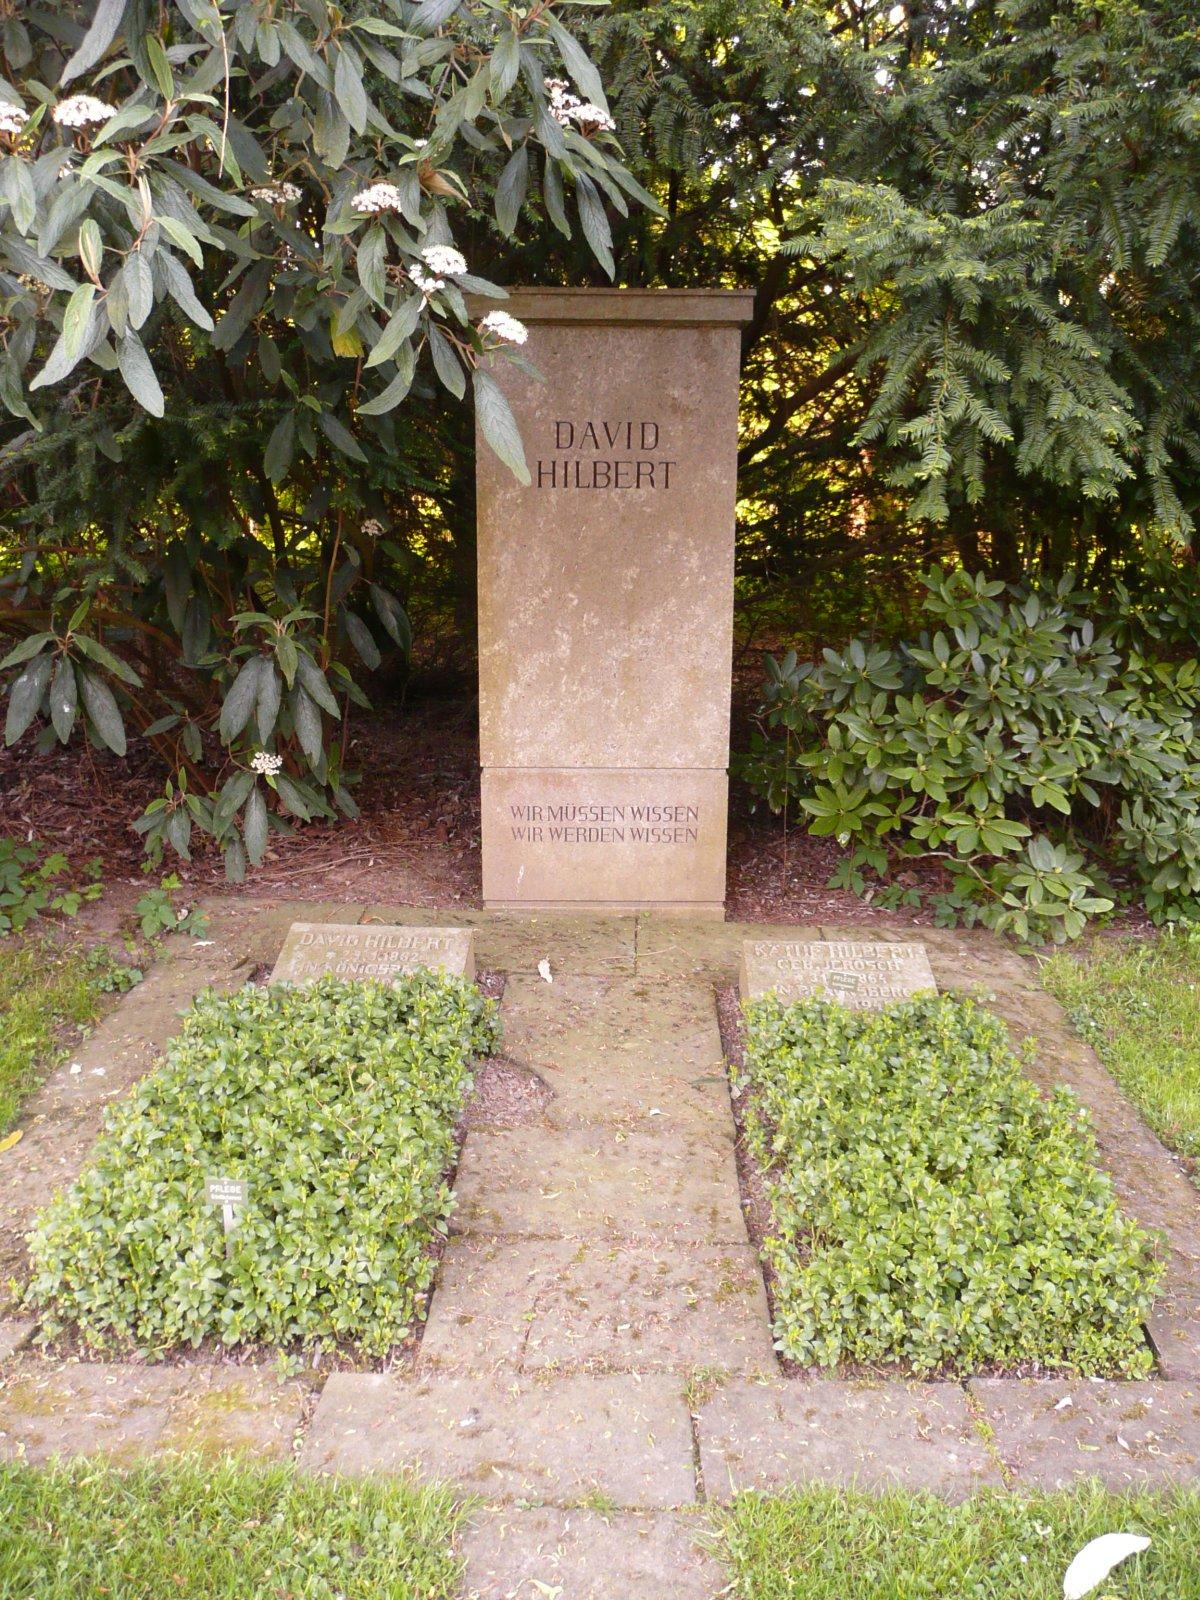 Hilbert epitafio